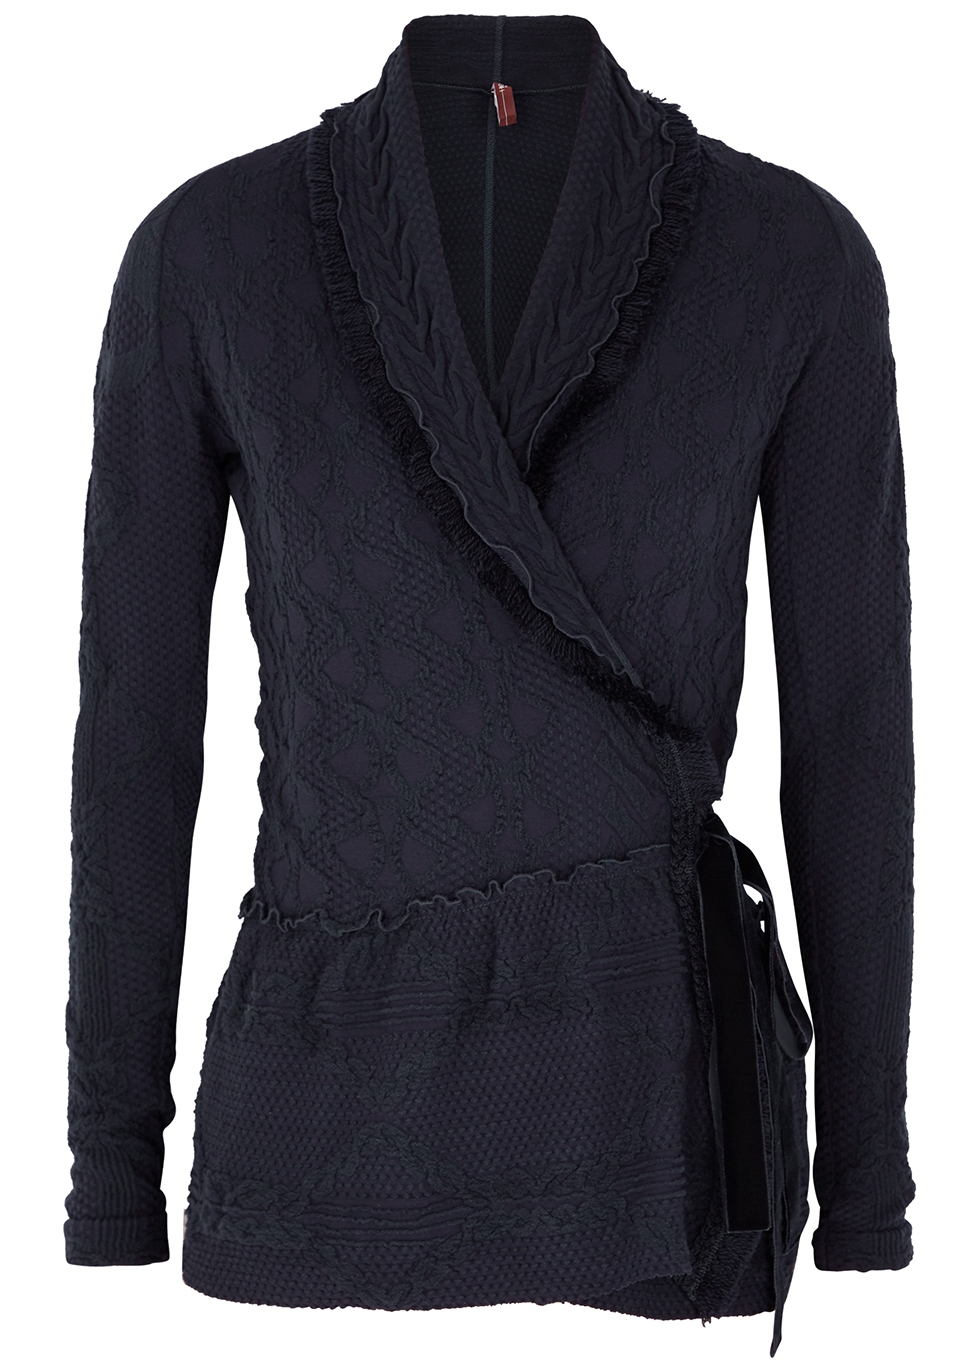 Ardent navy cotton-blend cardigan